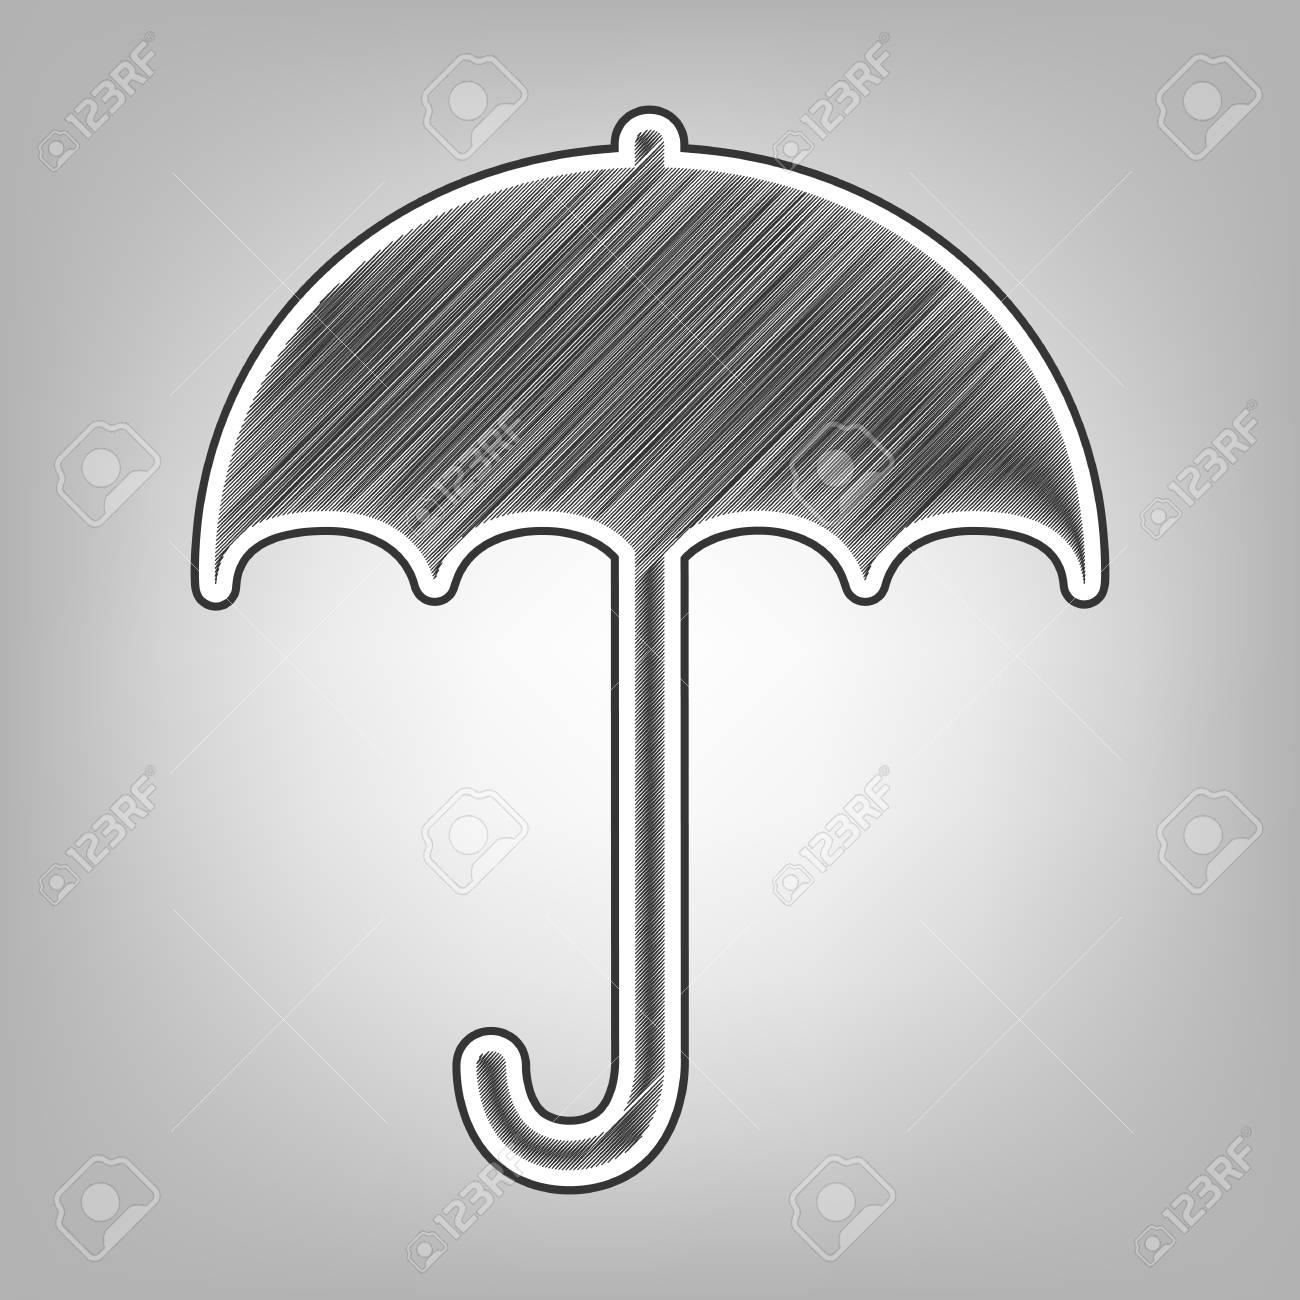 Umbrella sign icon rain protection symbol flat design style